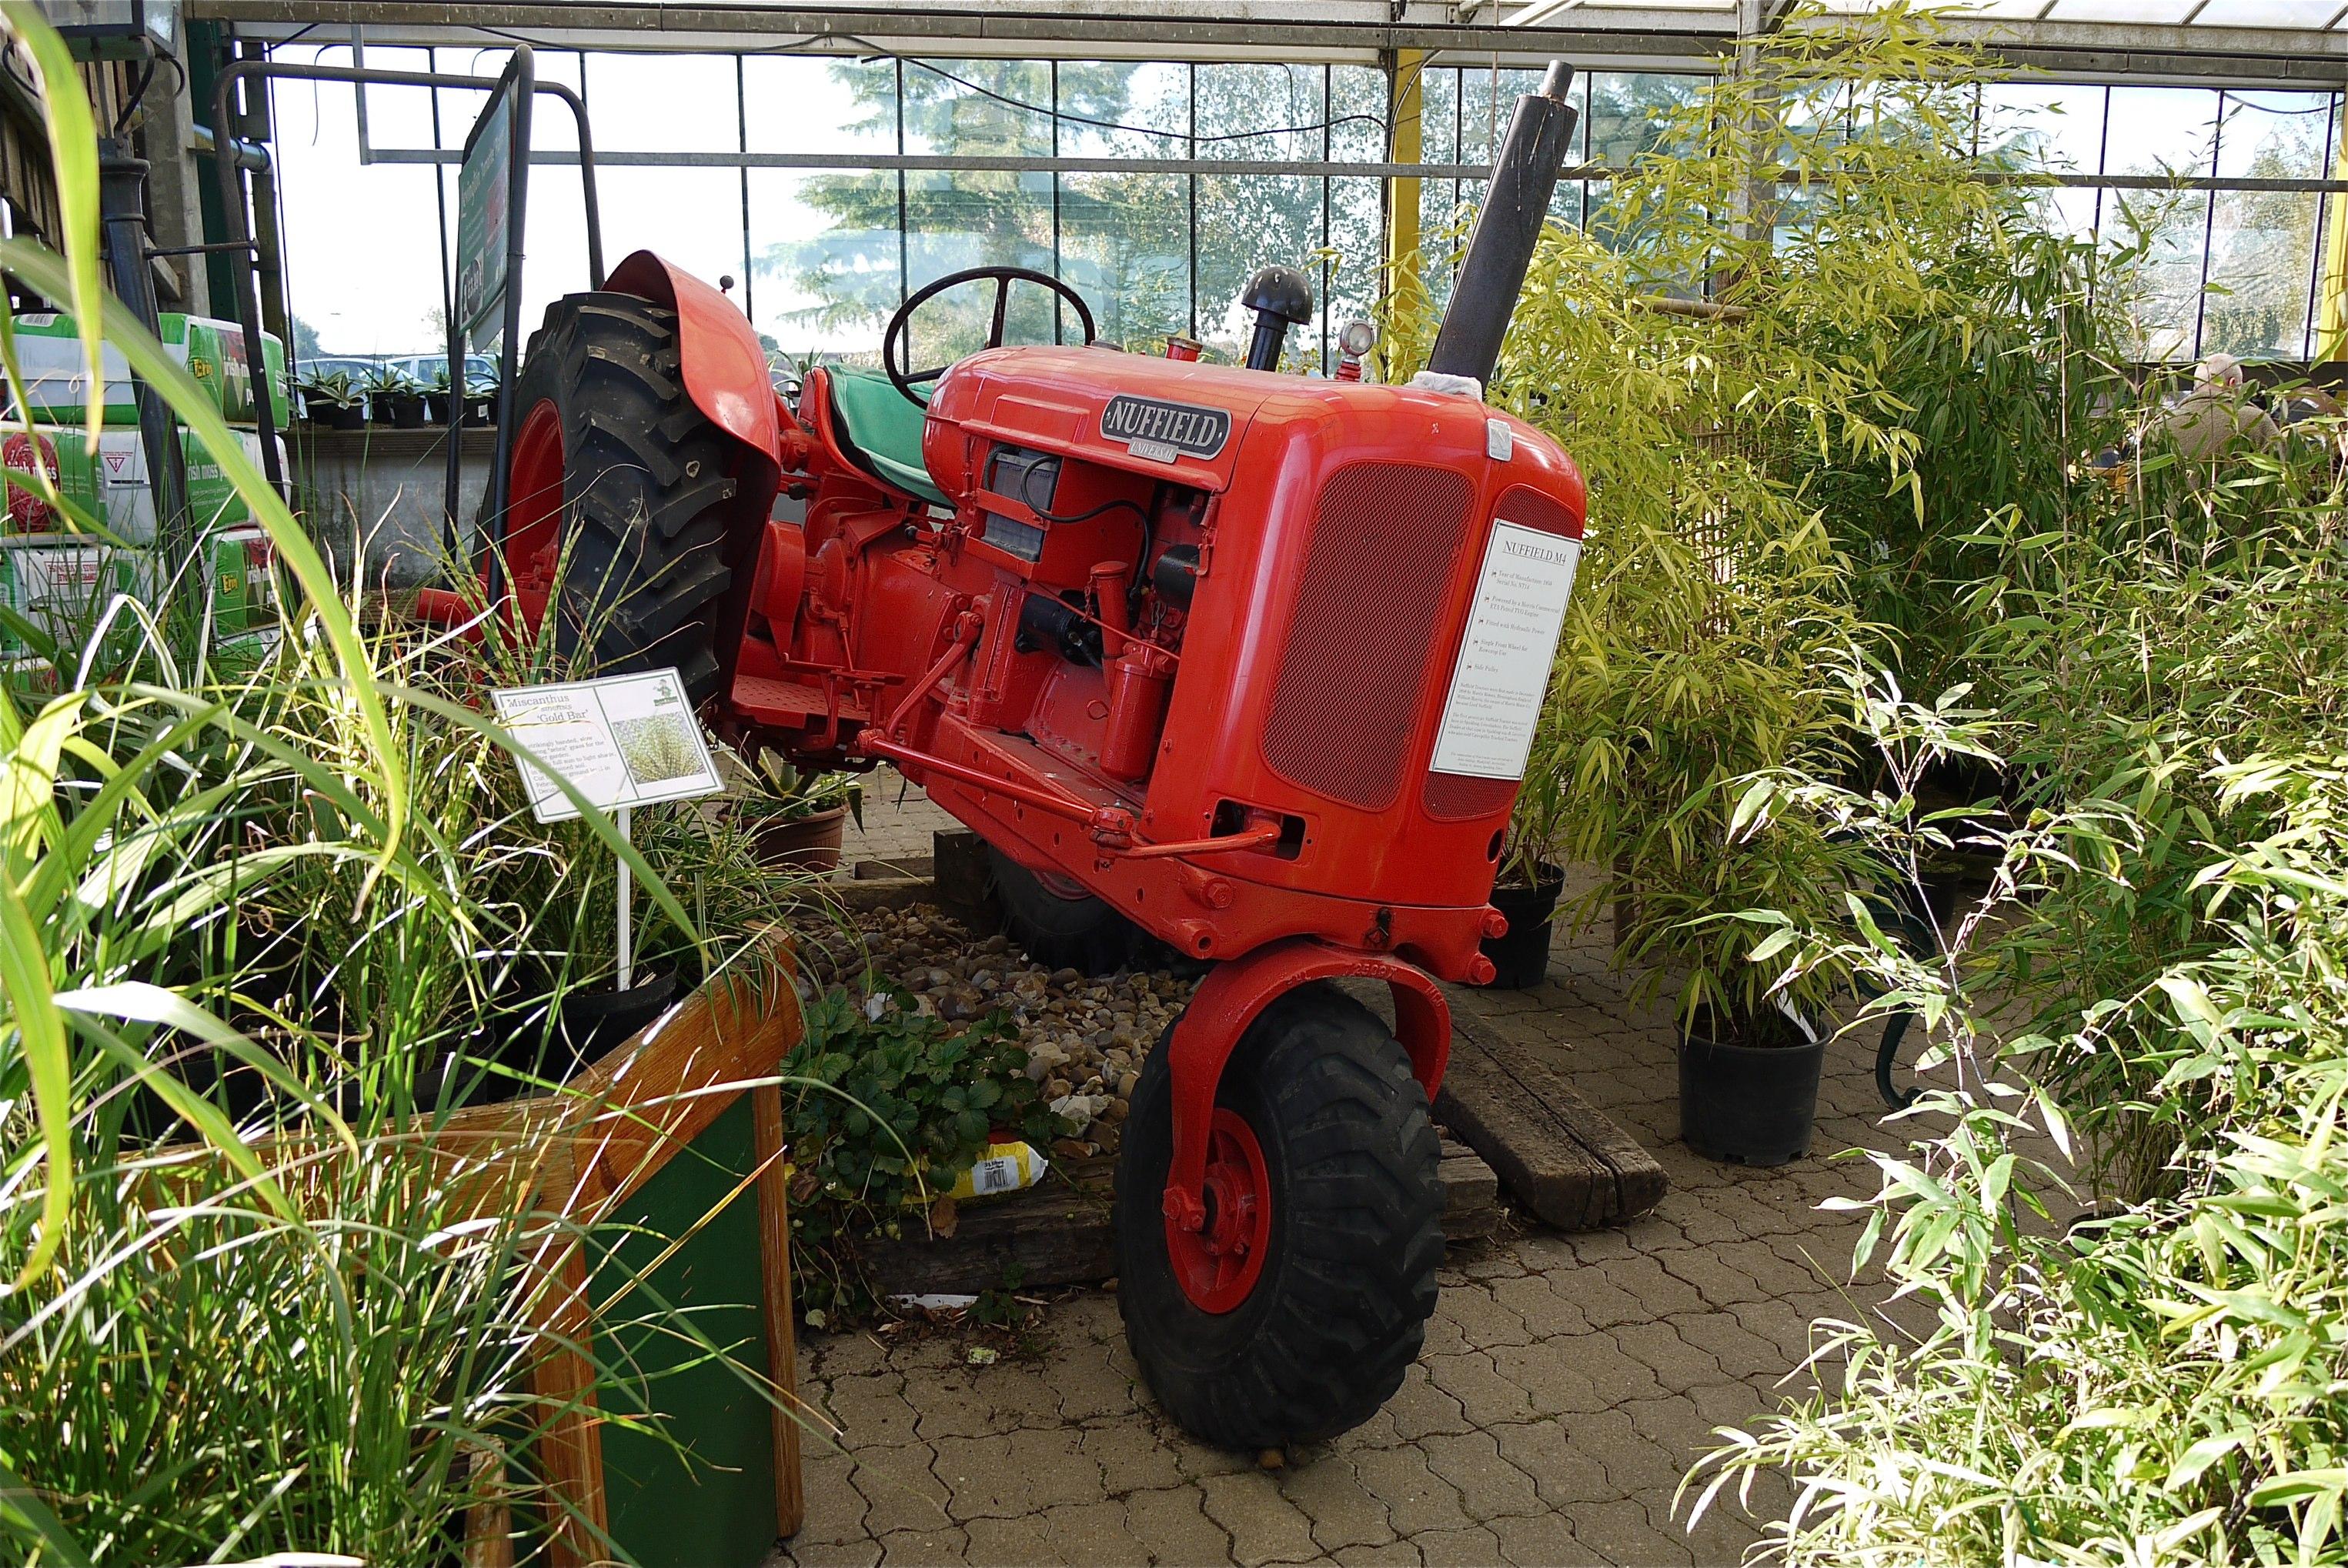 Custom Garden Tractor Exhaust Kawasaki V Twin Chrome Stack